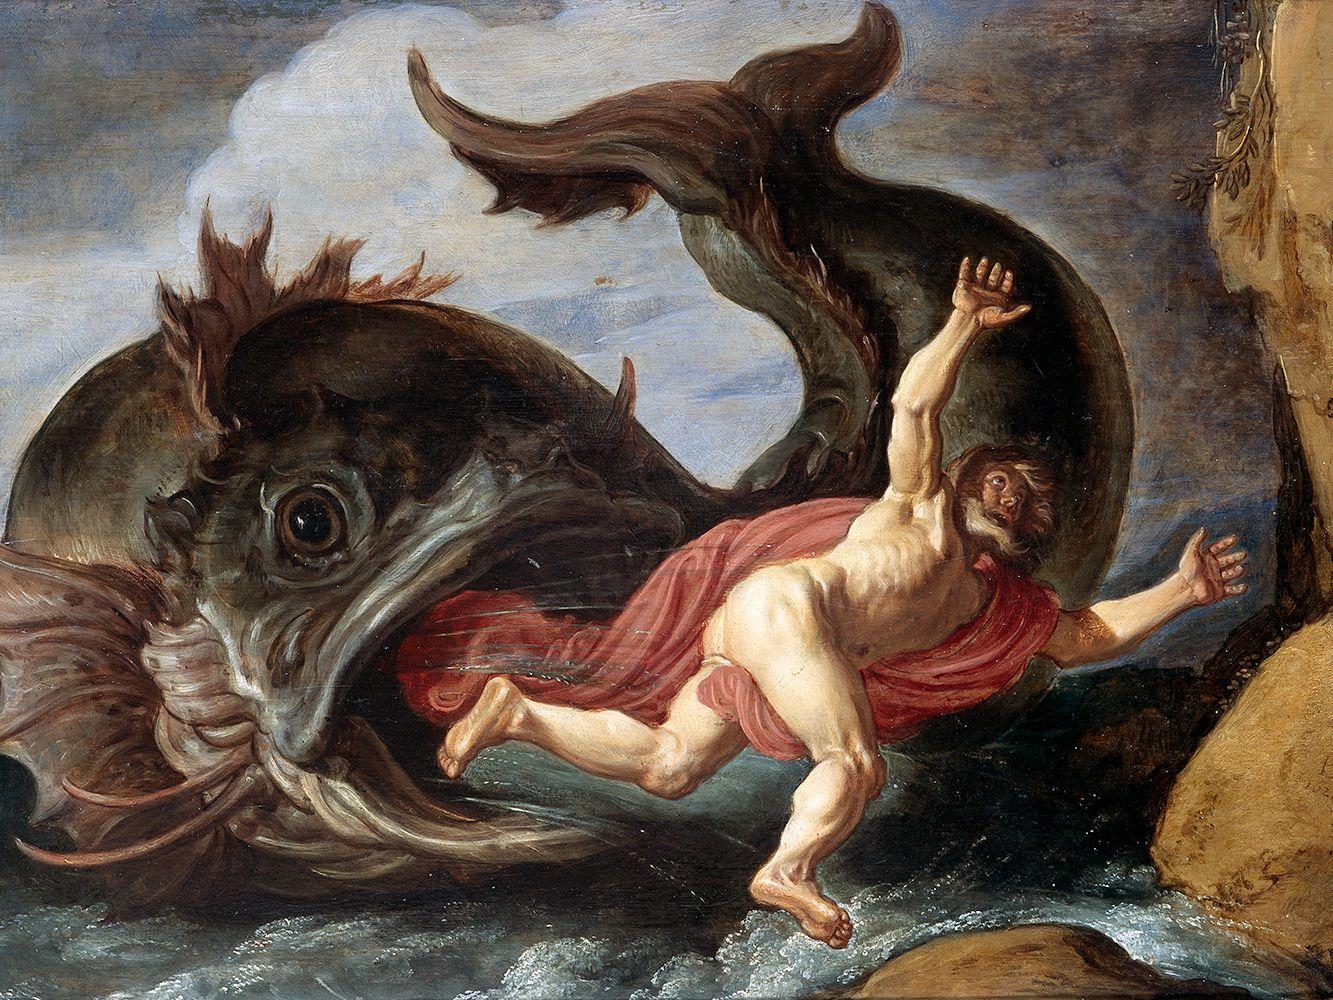 Irak: hallan algo inquietante debajo de la tumba del profeta Jonás